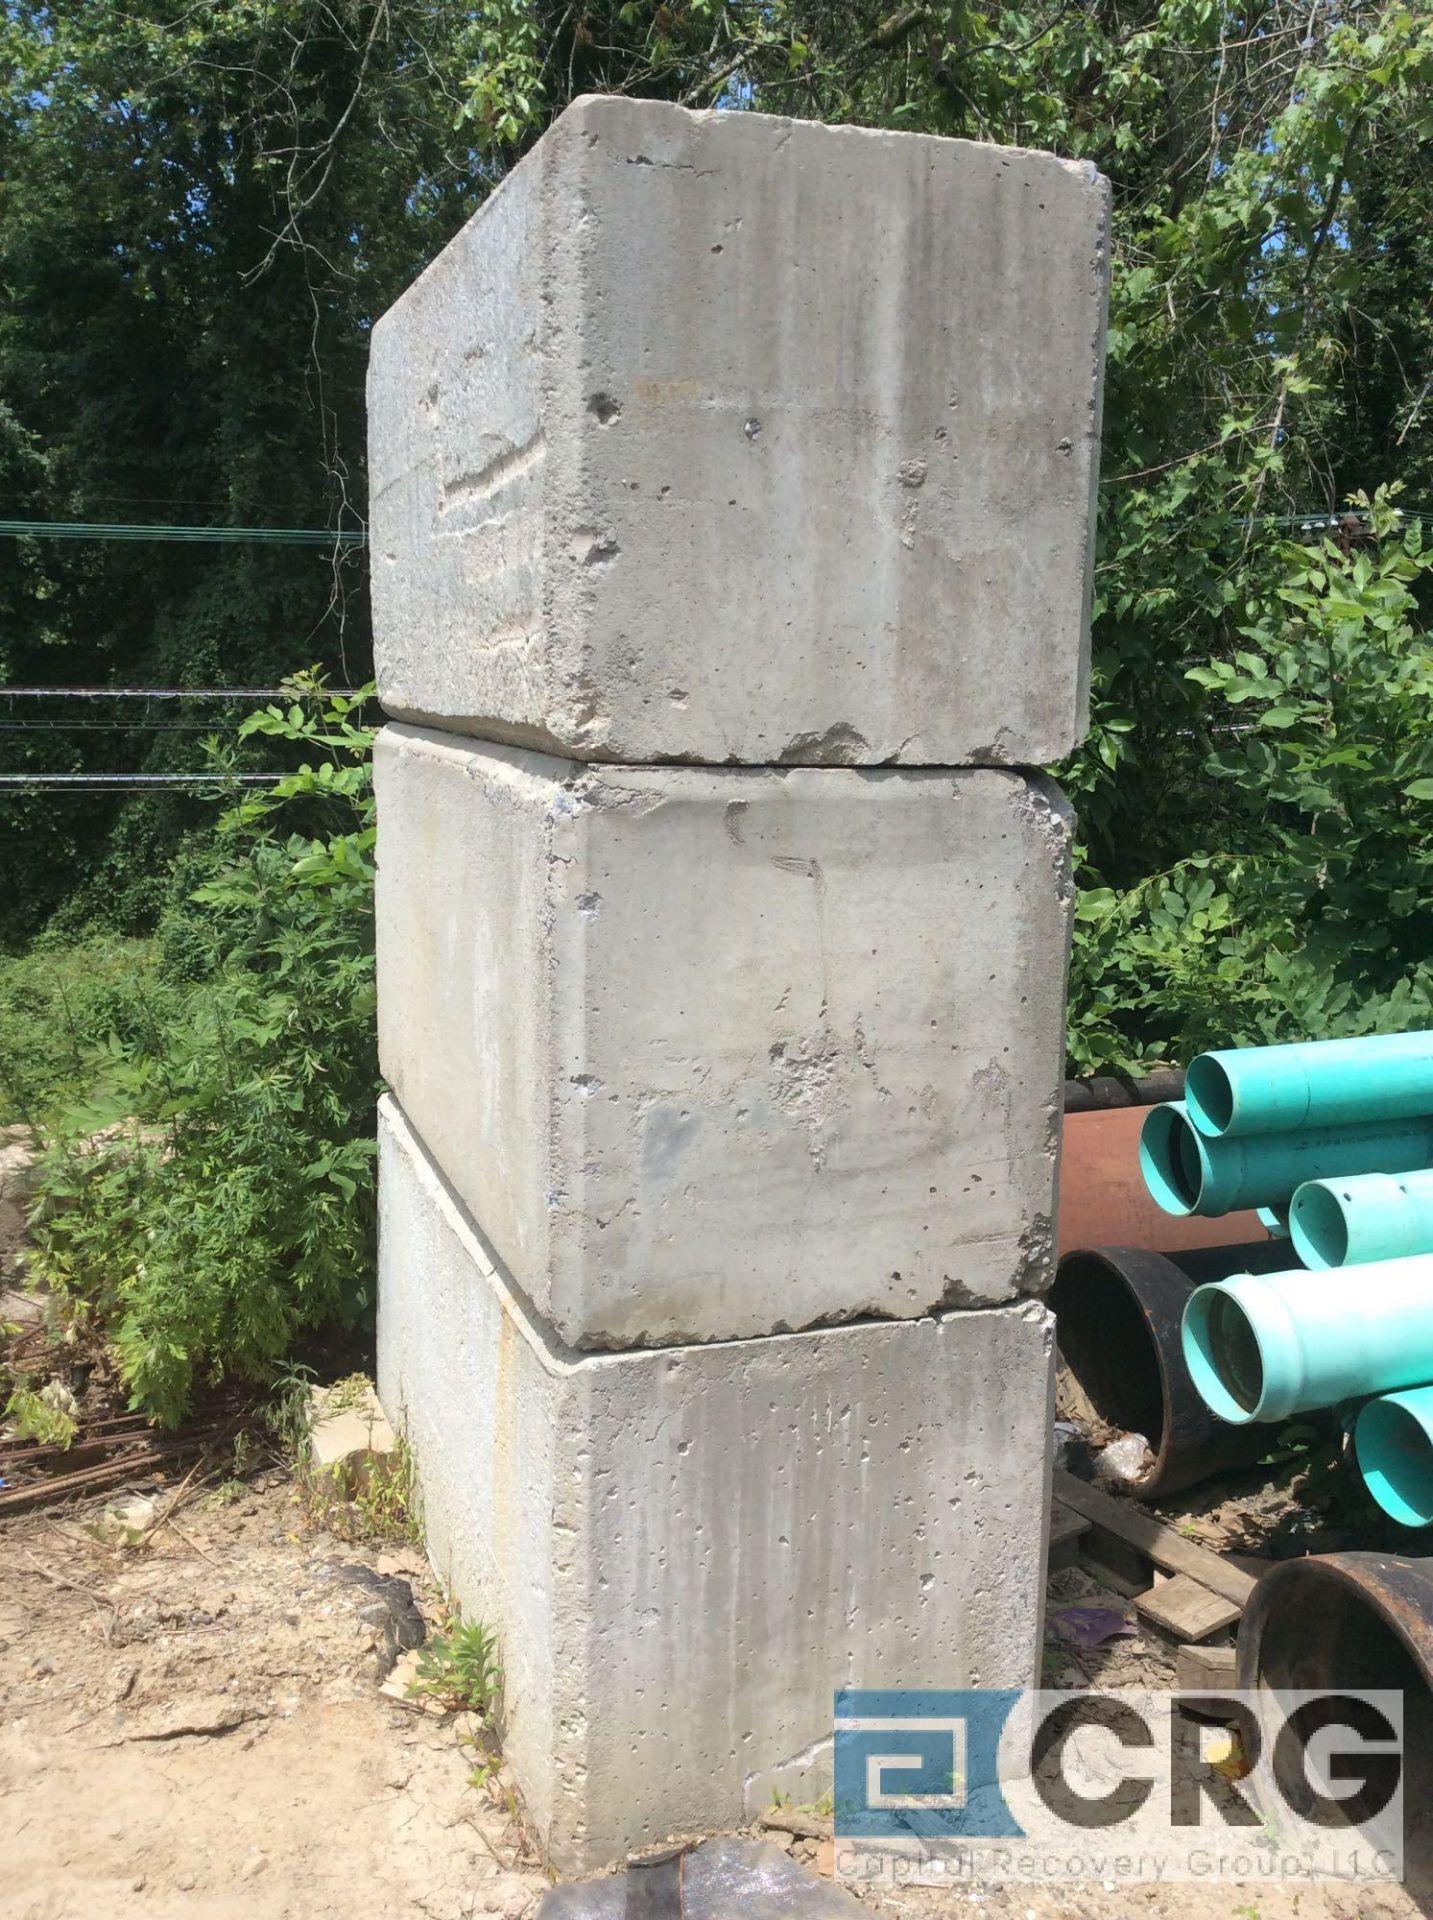 Lot 472 - Lot of (3) 3 x 3 X 4 foot long concrete blocks